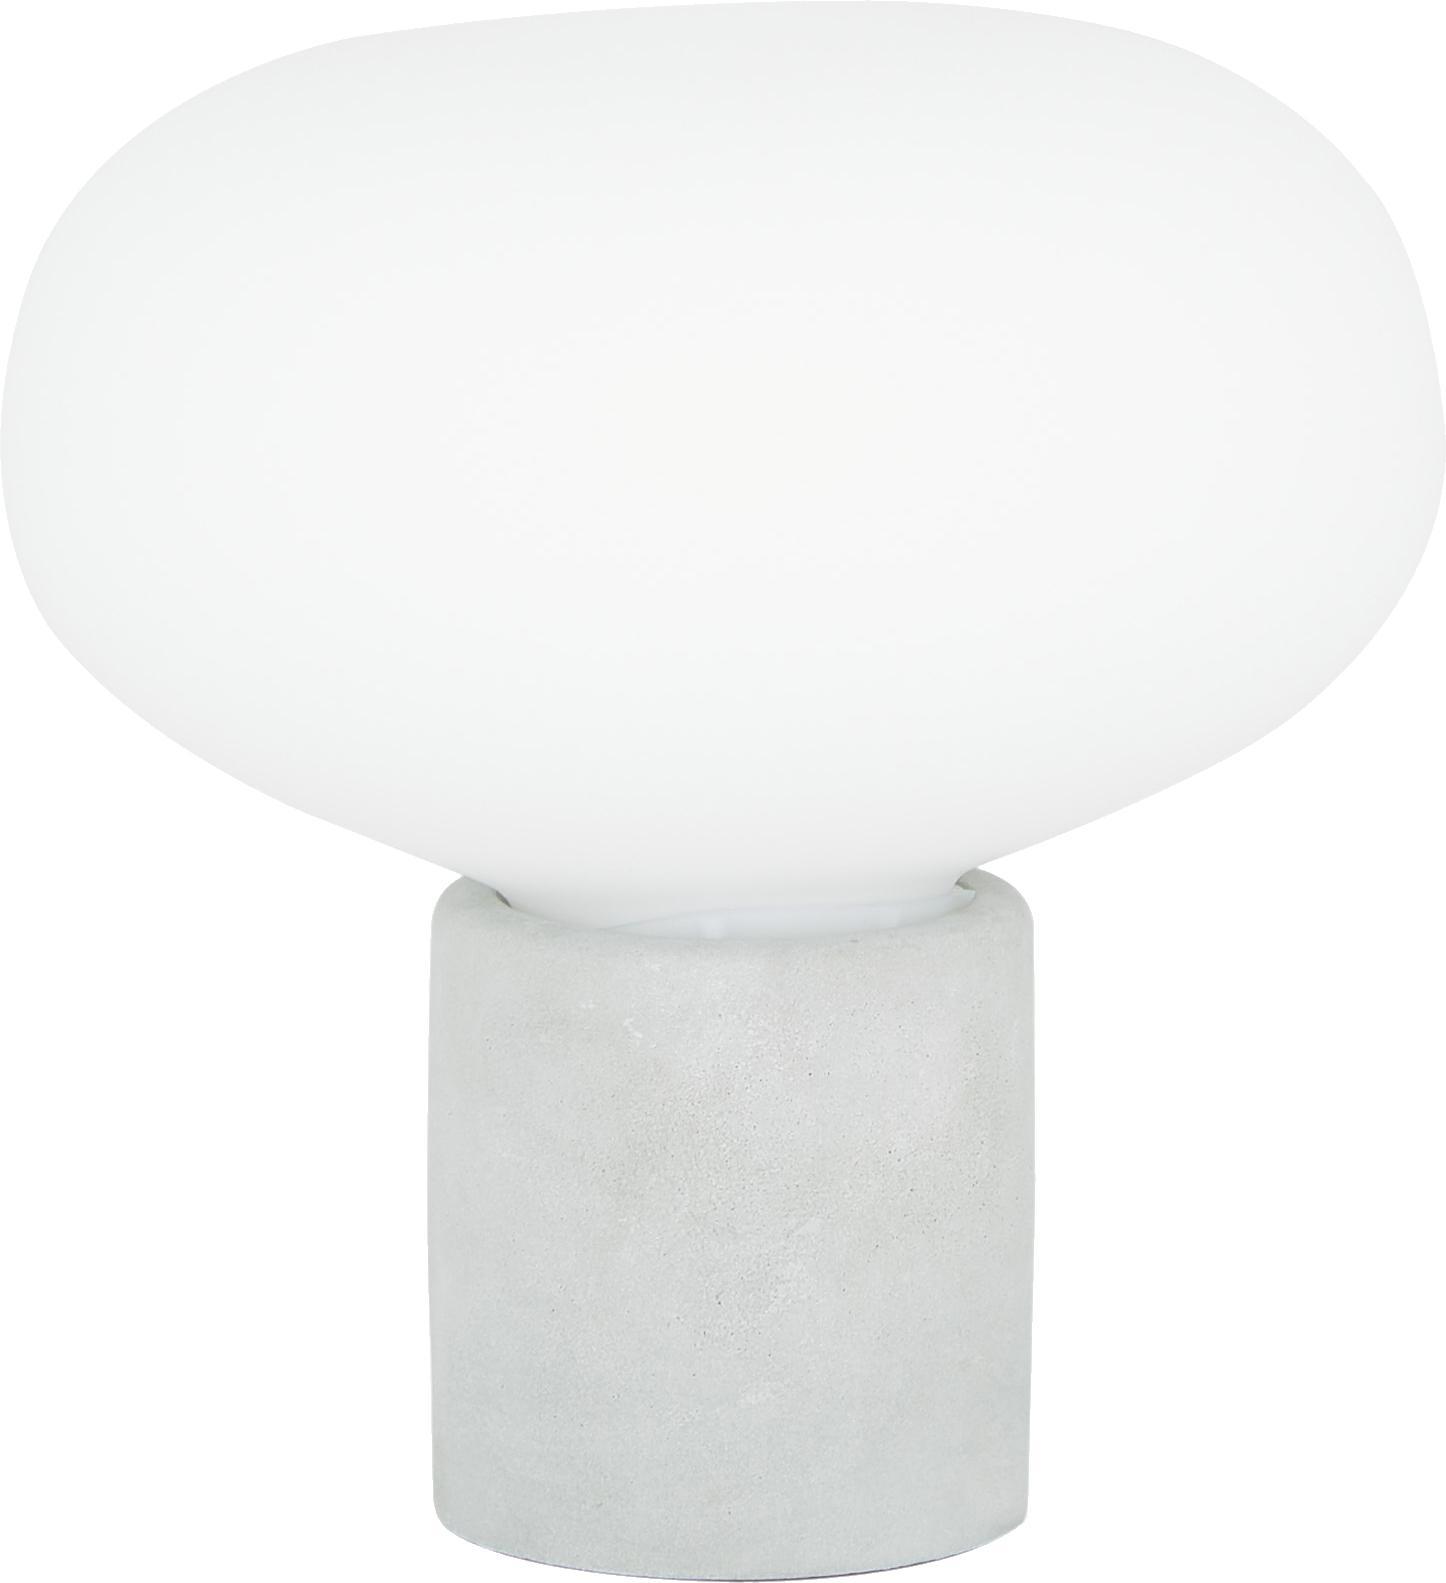 Tafellamp Alma betonnen voet, Lampvoet: beton, Lampenkap: glas, Lampvoet: grijs, betonkleurig. Lampenkap: wit, Ø 23 x H 24 cm